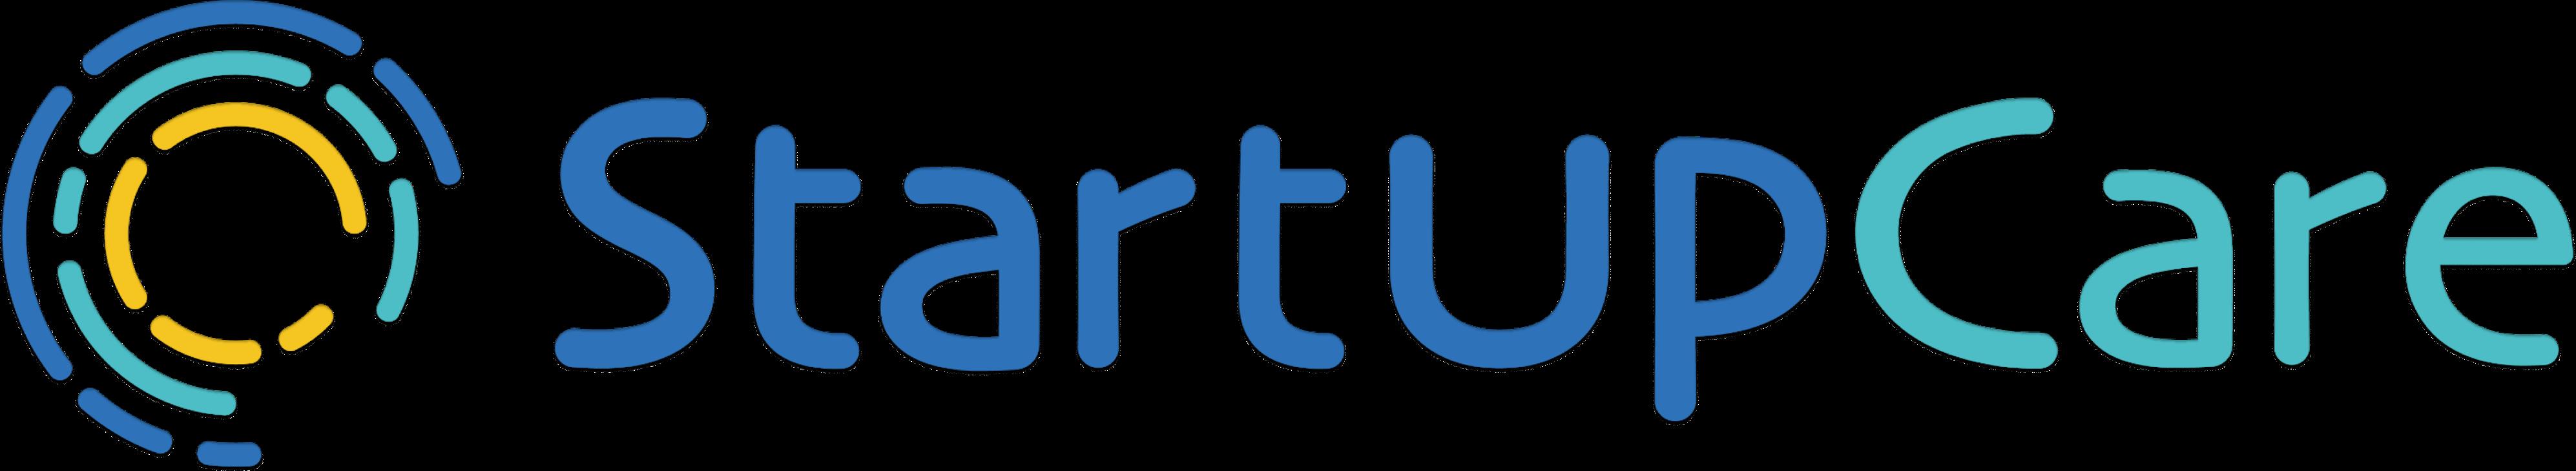 StartupCare logo